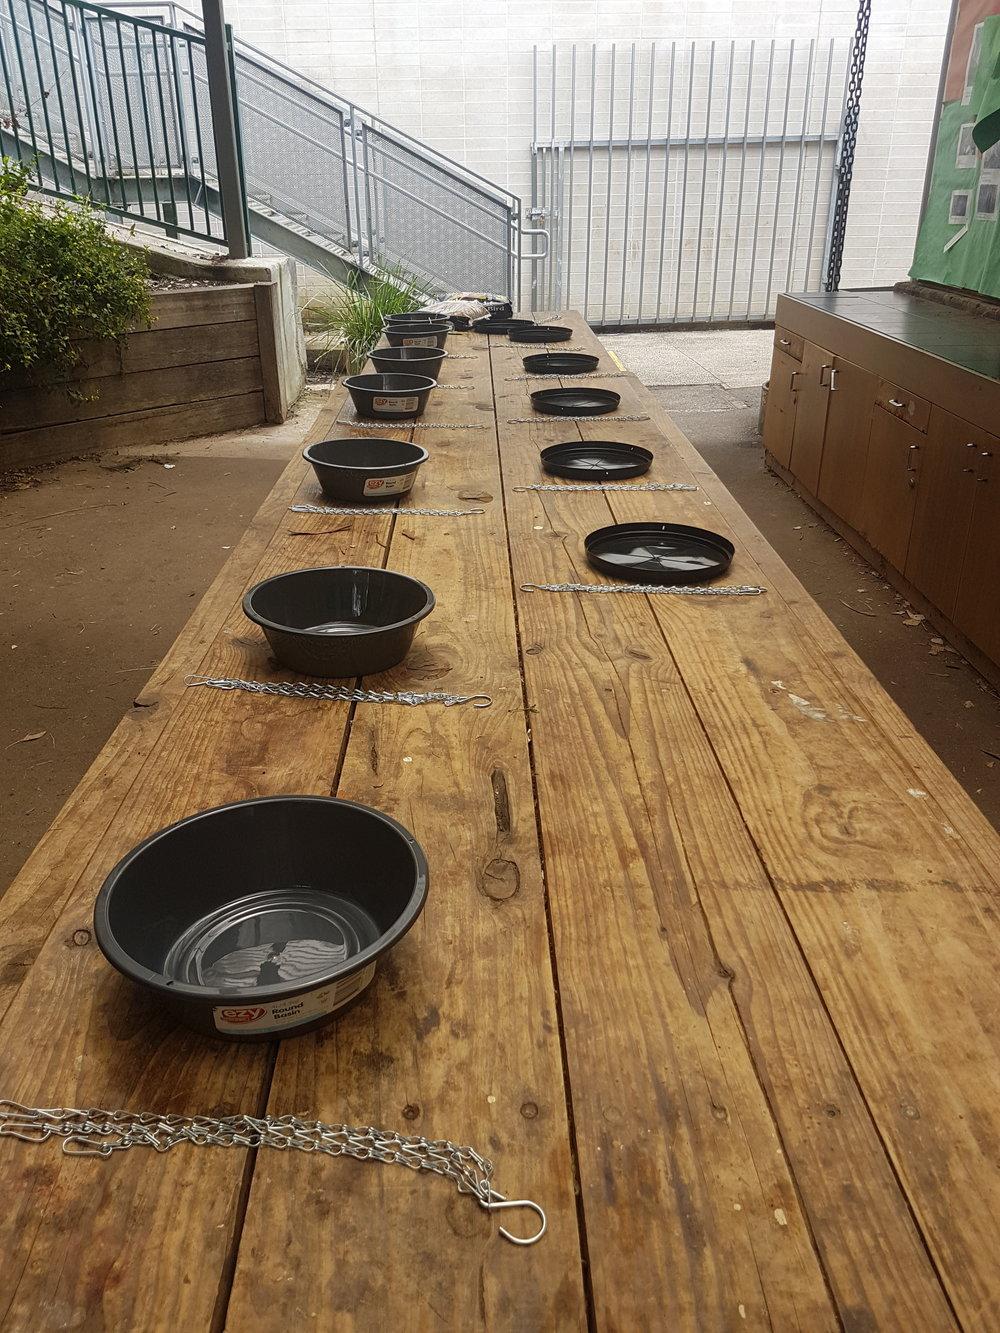 Constructing our bird feeders